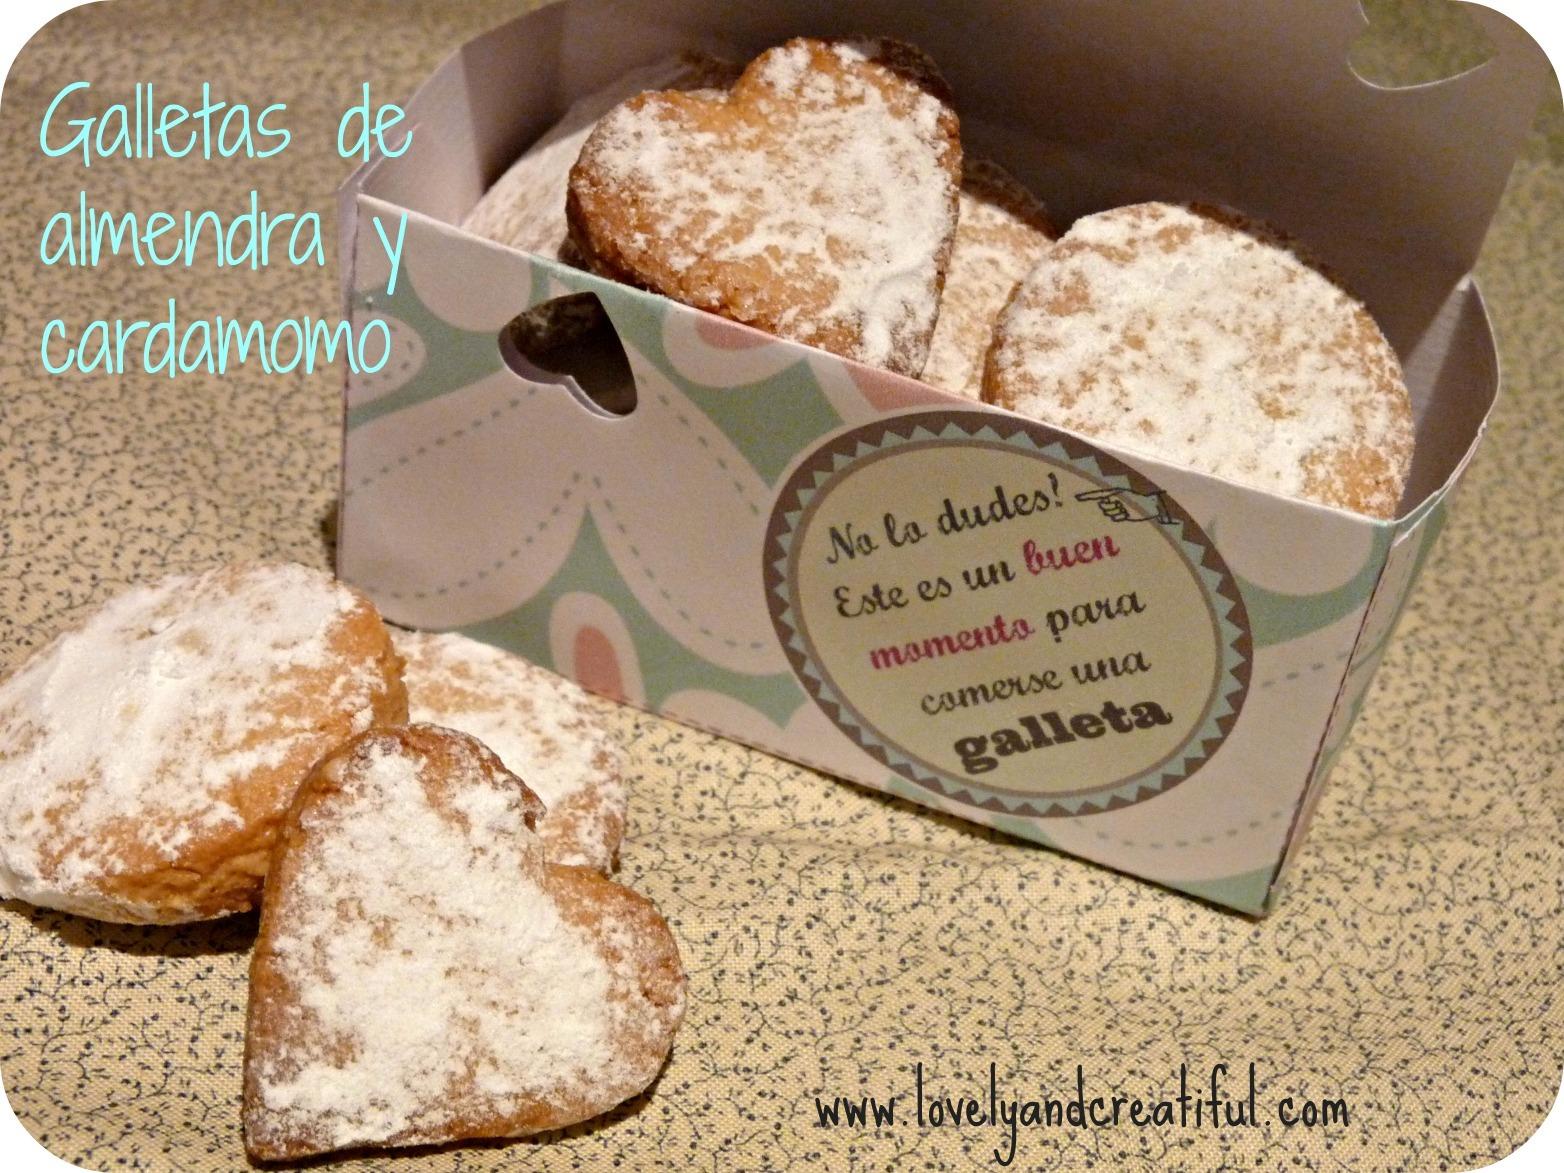 Galleta_almendra_cardamomo